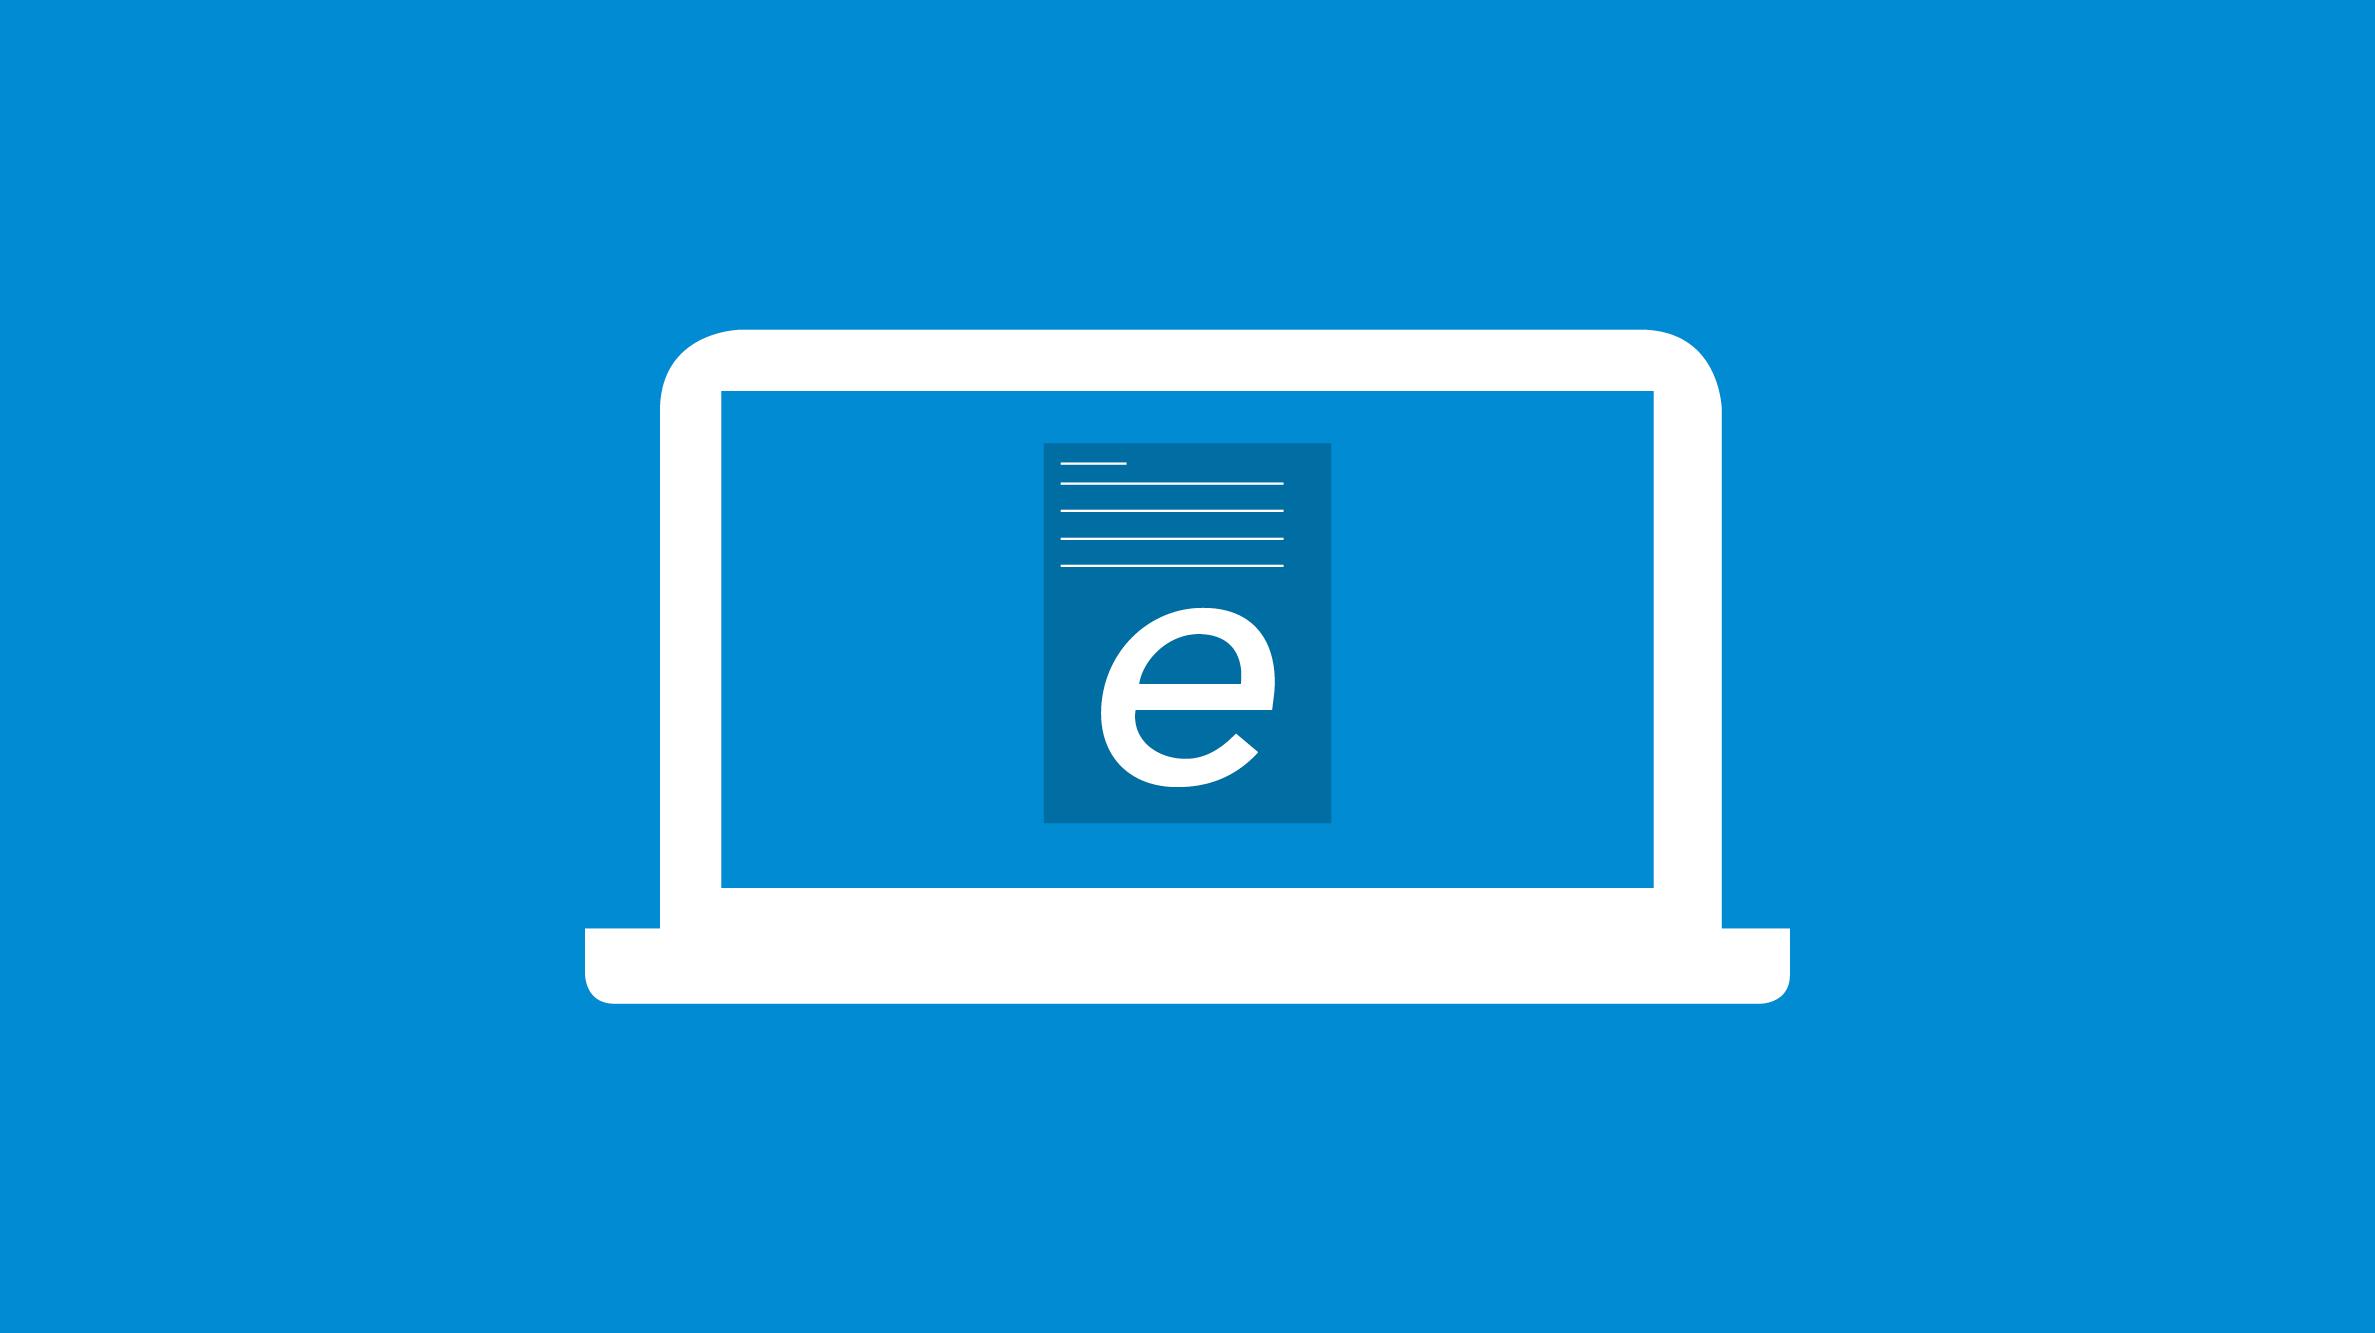 E-Rechnung auf dem Computer